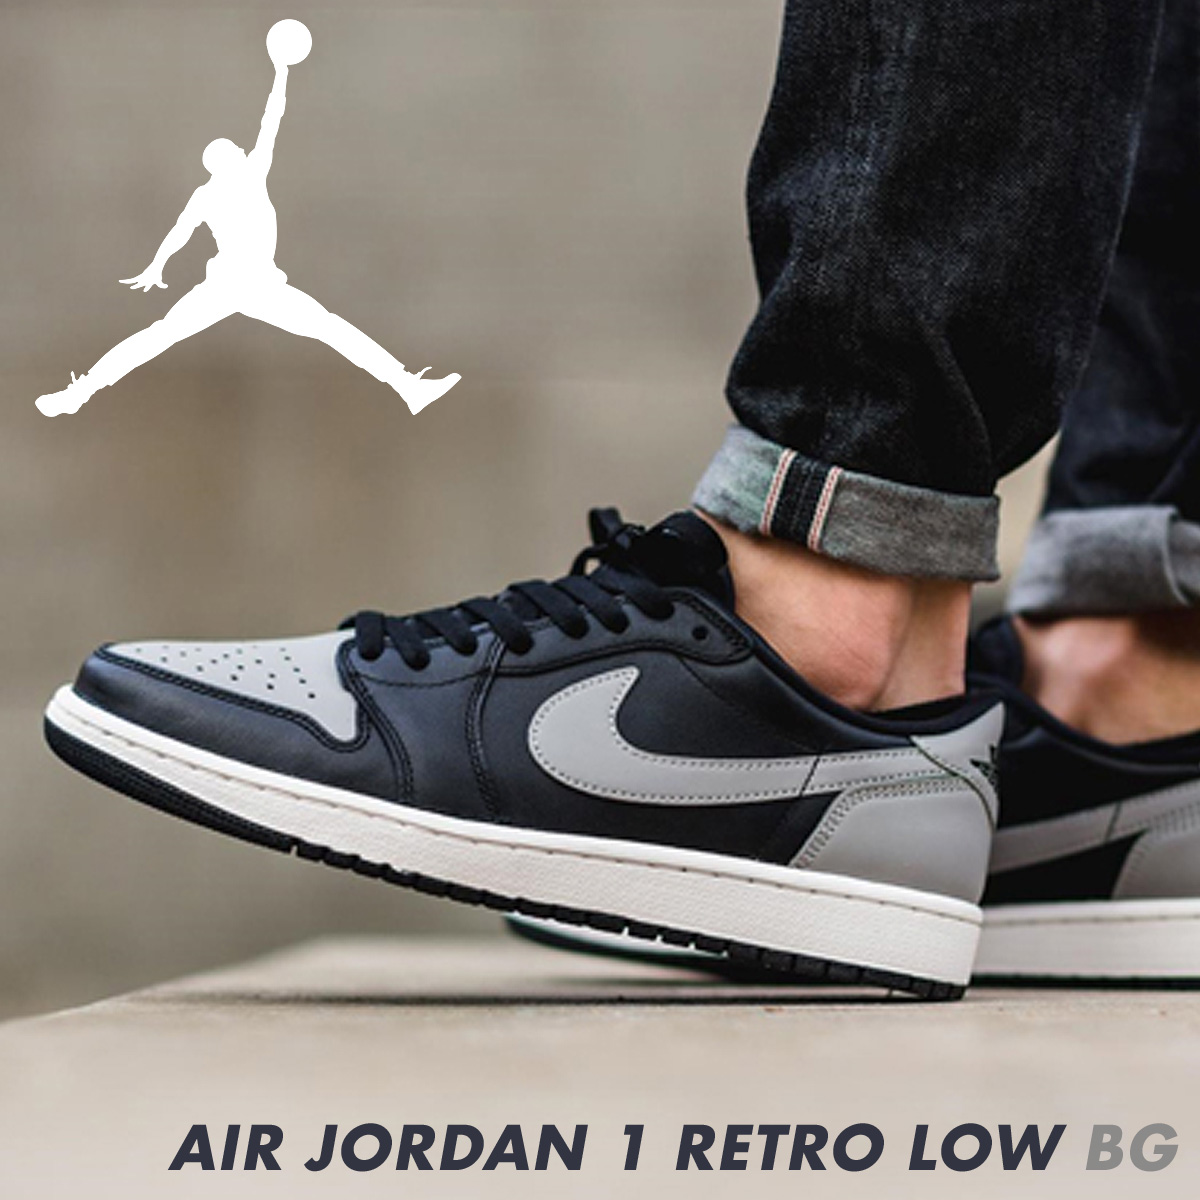 Air Retro Lady's Nike Jordan Sneakers Shoes Gray1012 Low Load Shinnyu Bg 999 Nostalgic 709 1 003 WEH92IDY